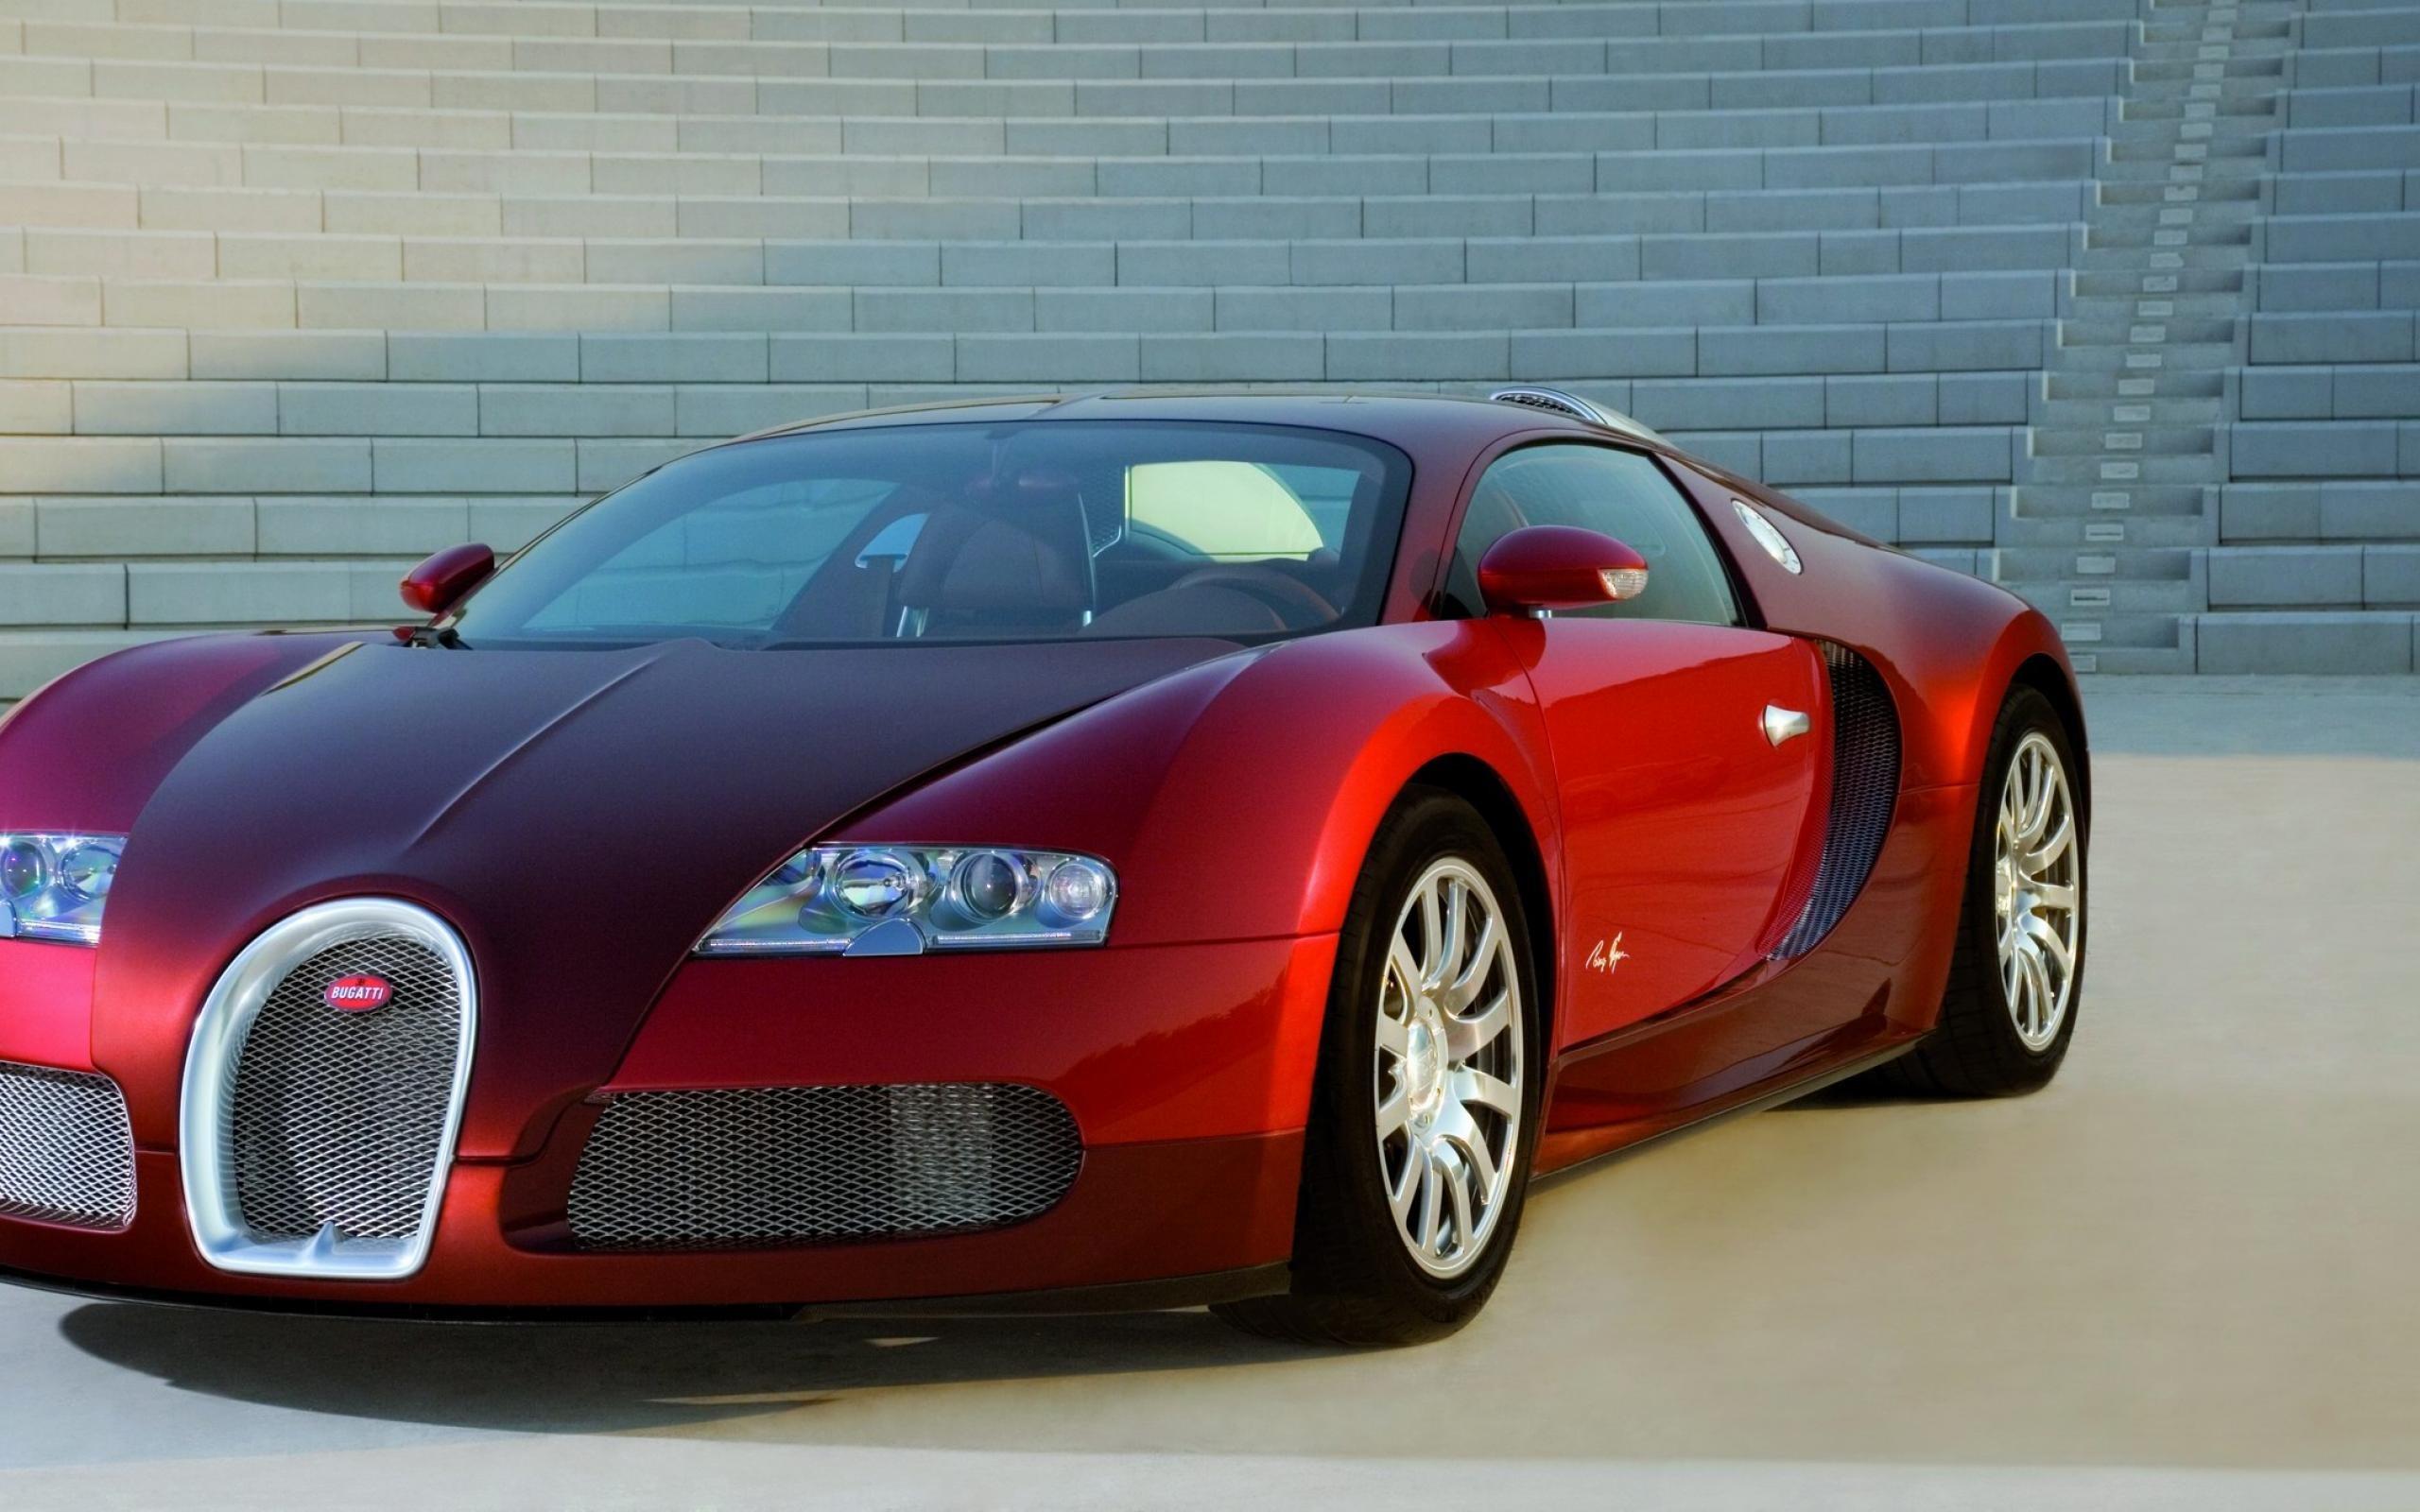 Bugatti Veyron Centenaire Cars Desktop Wallpaper Desktop Background 2560x1600